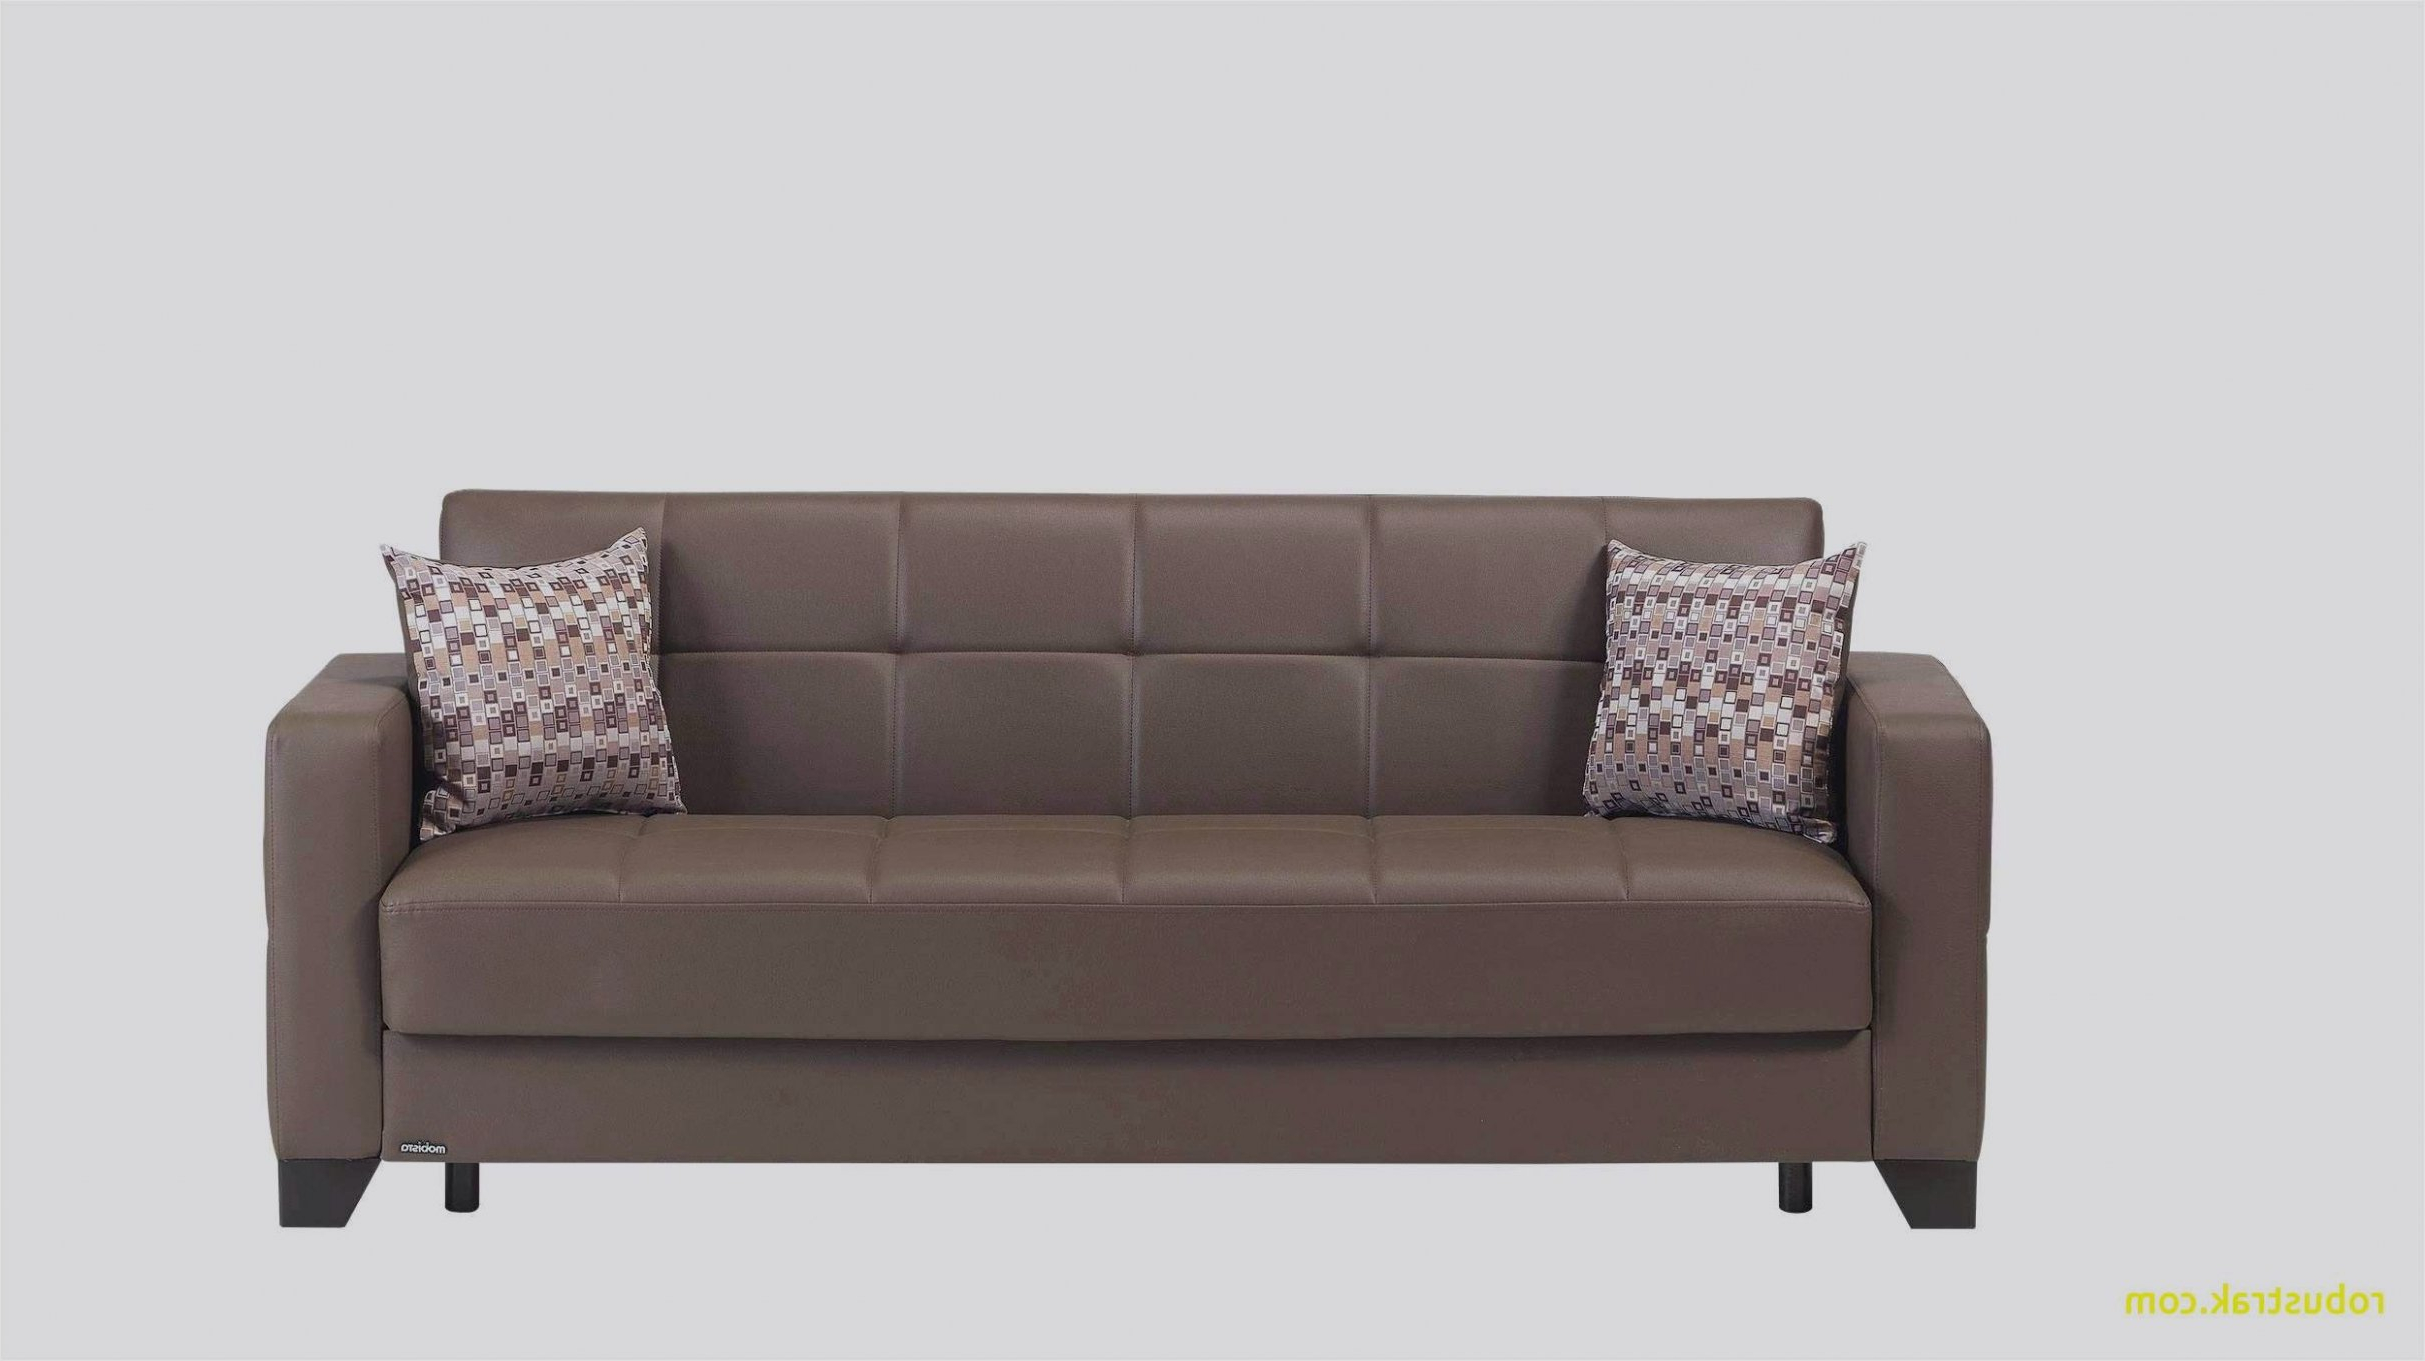 Sofas Buenos Y Comodos Txdf sofas Buenos Y Odos Hermoso De Aºpa Donde Prar sofas